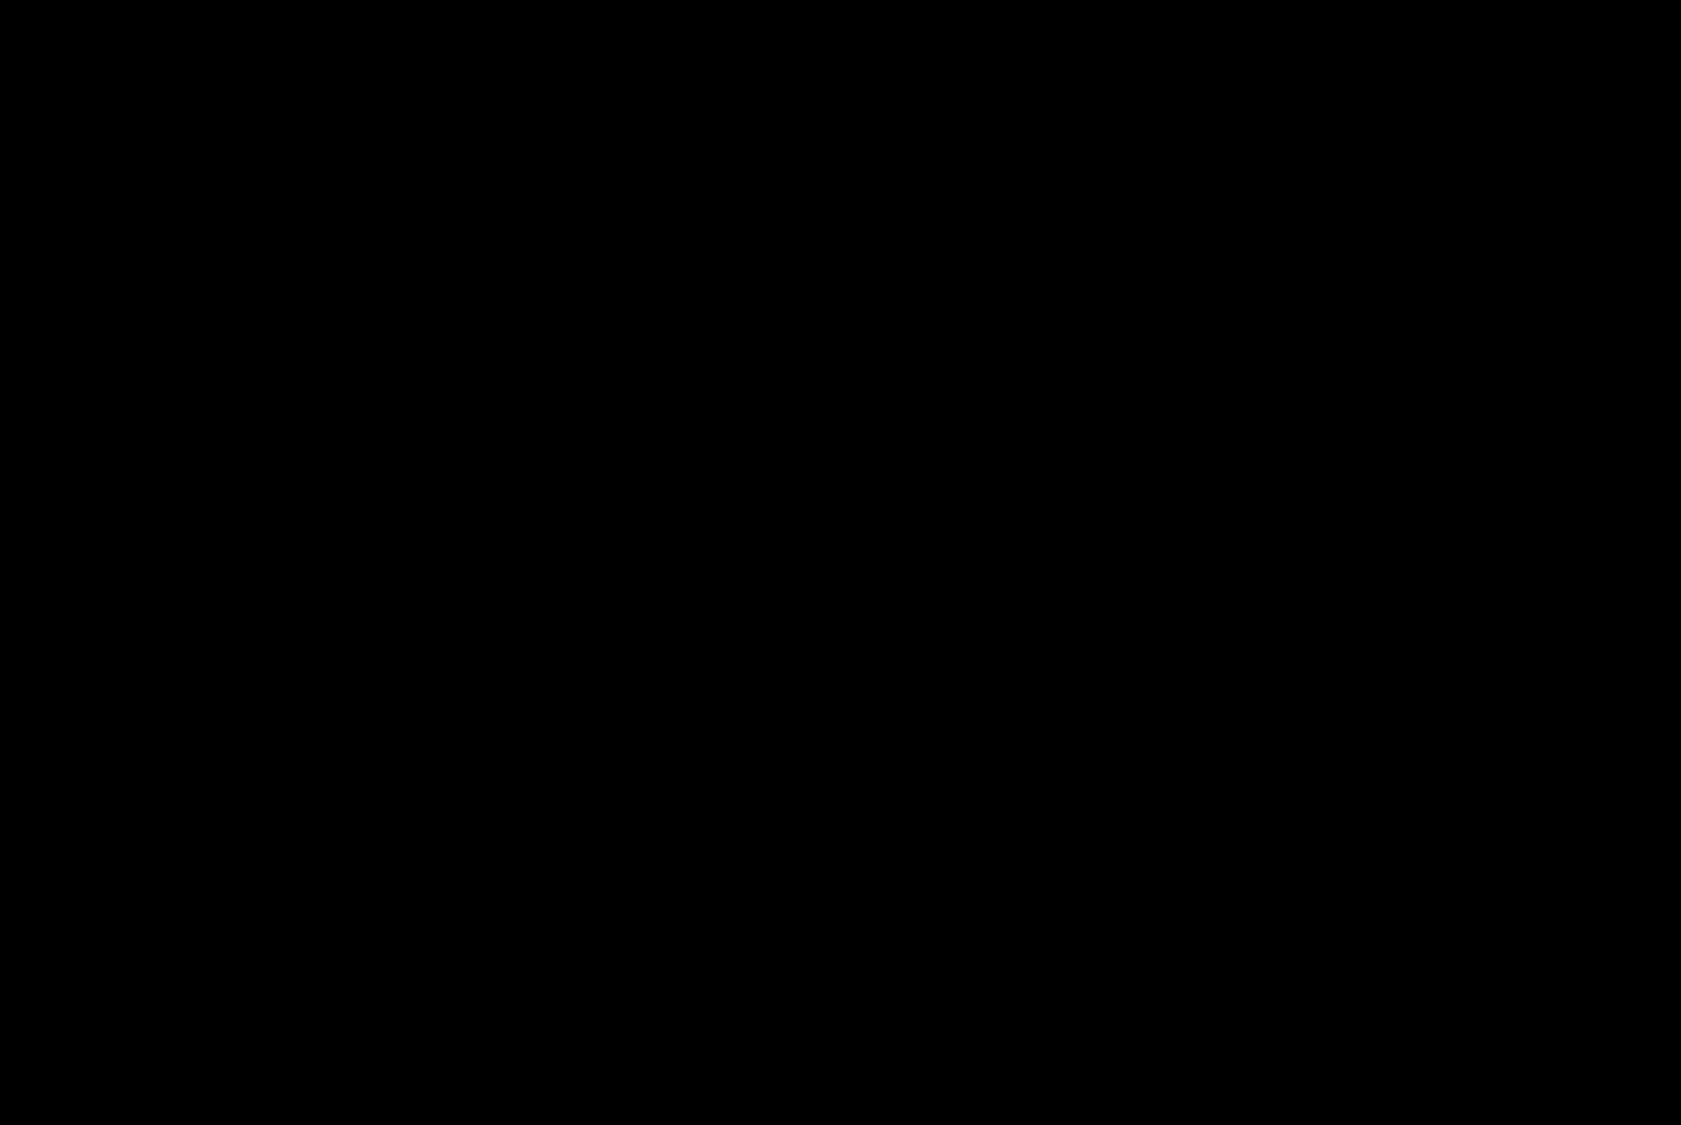 Salovaara & Kosch Group